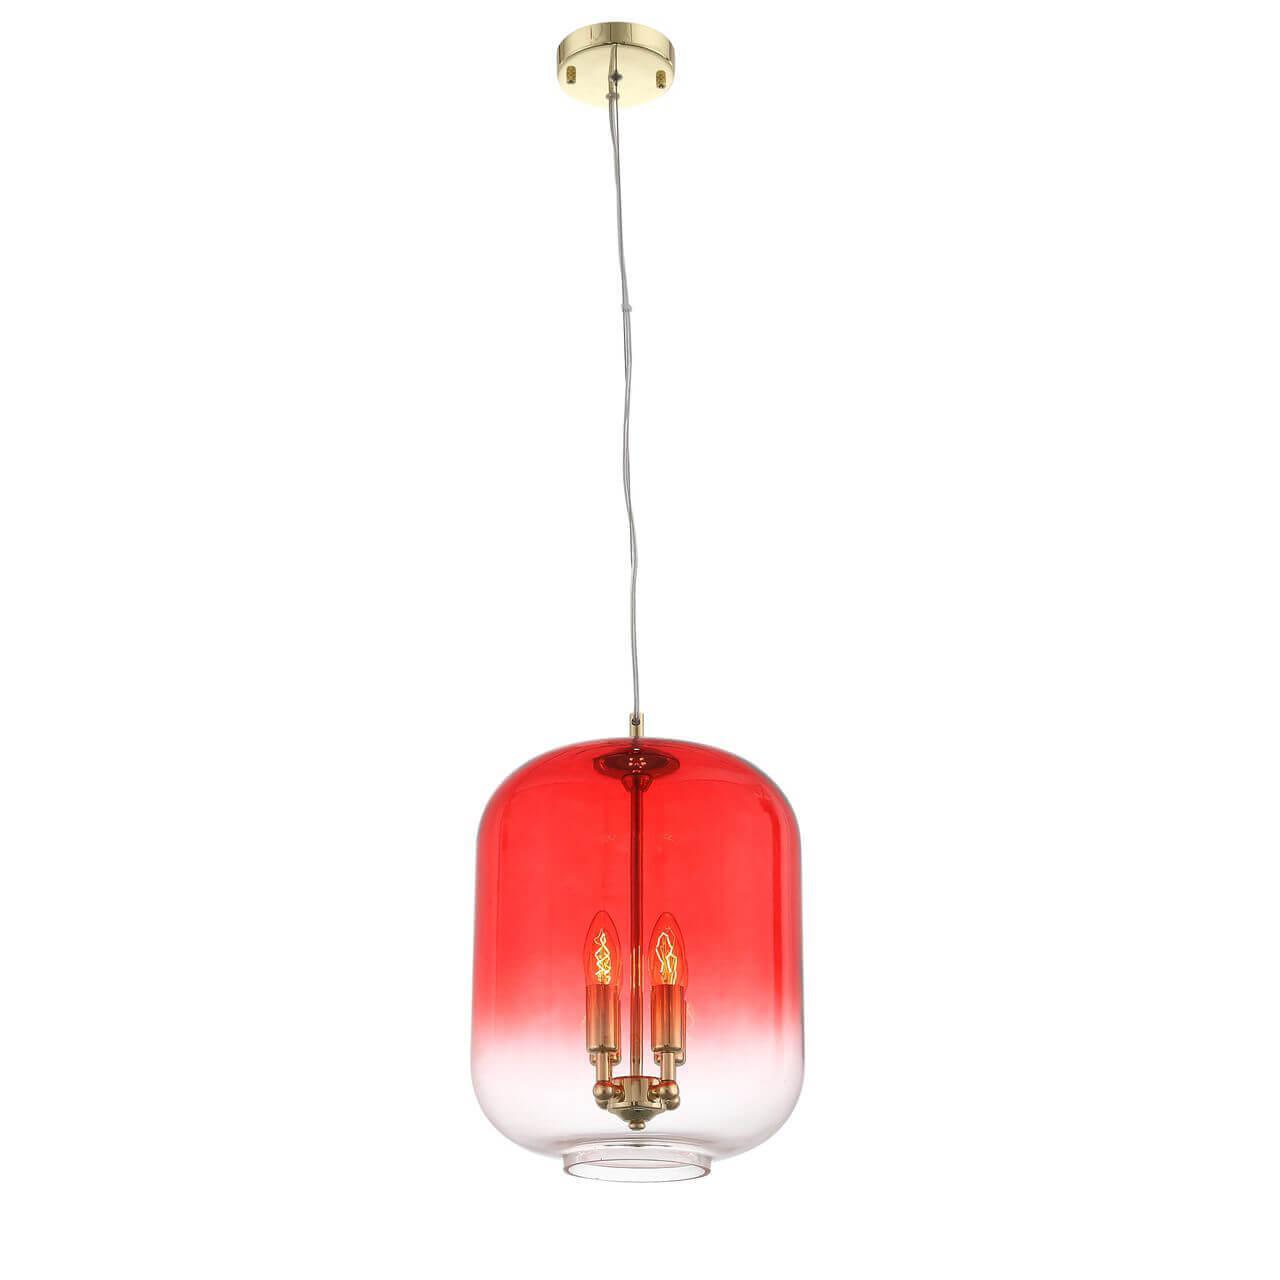 Светильник ST Luce SL369.203.04 Fiamrosa светильник подвесной st luce sl367 203 04 золото